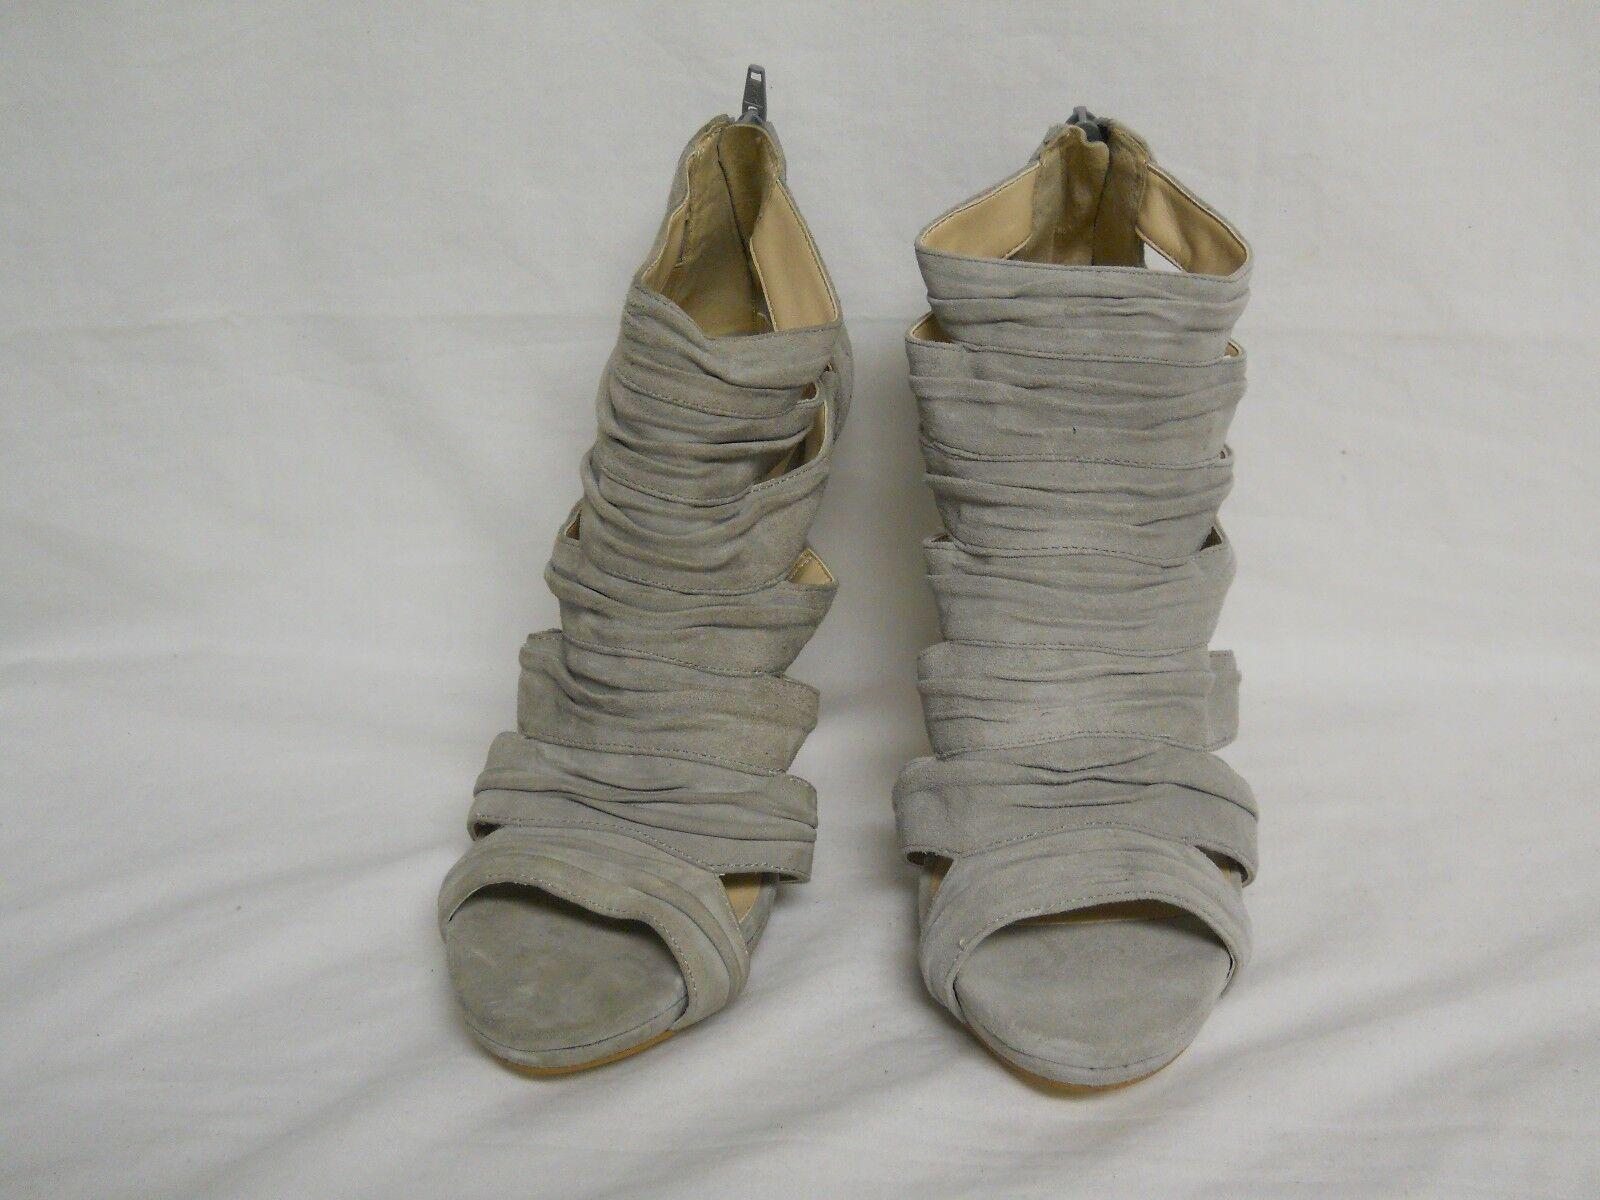 INC Gray International Concepts Kiera New Store Display Damenschuhe Gray INC Heels 9.5 M Schuhes 26ebe7